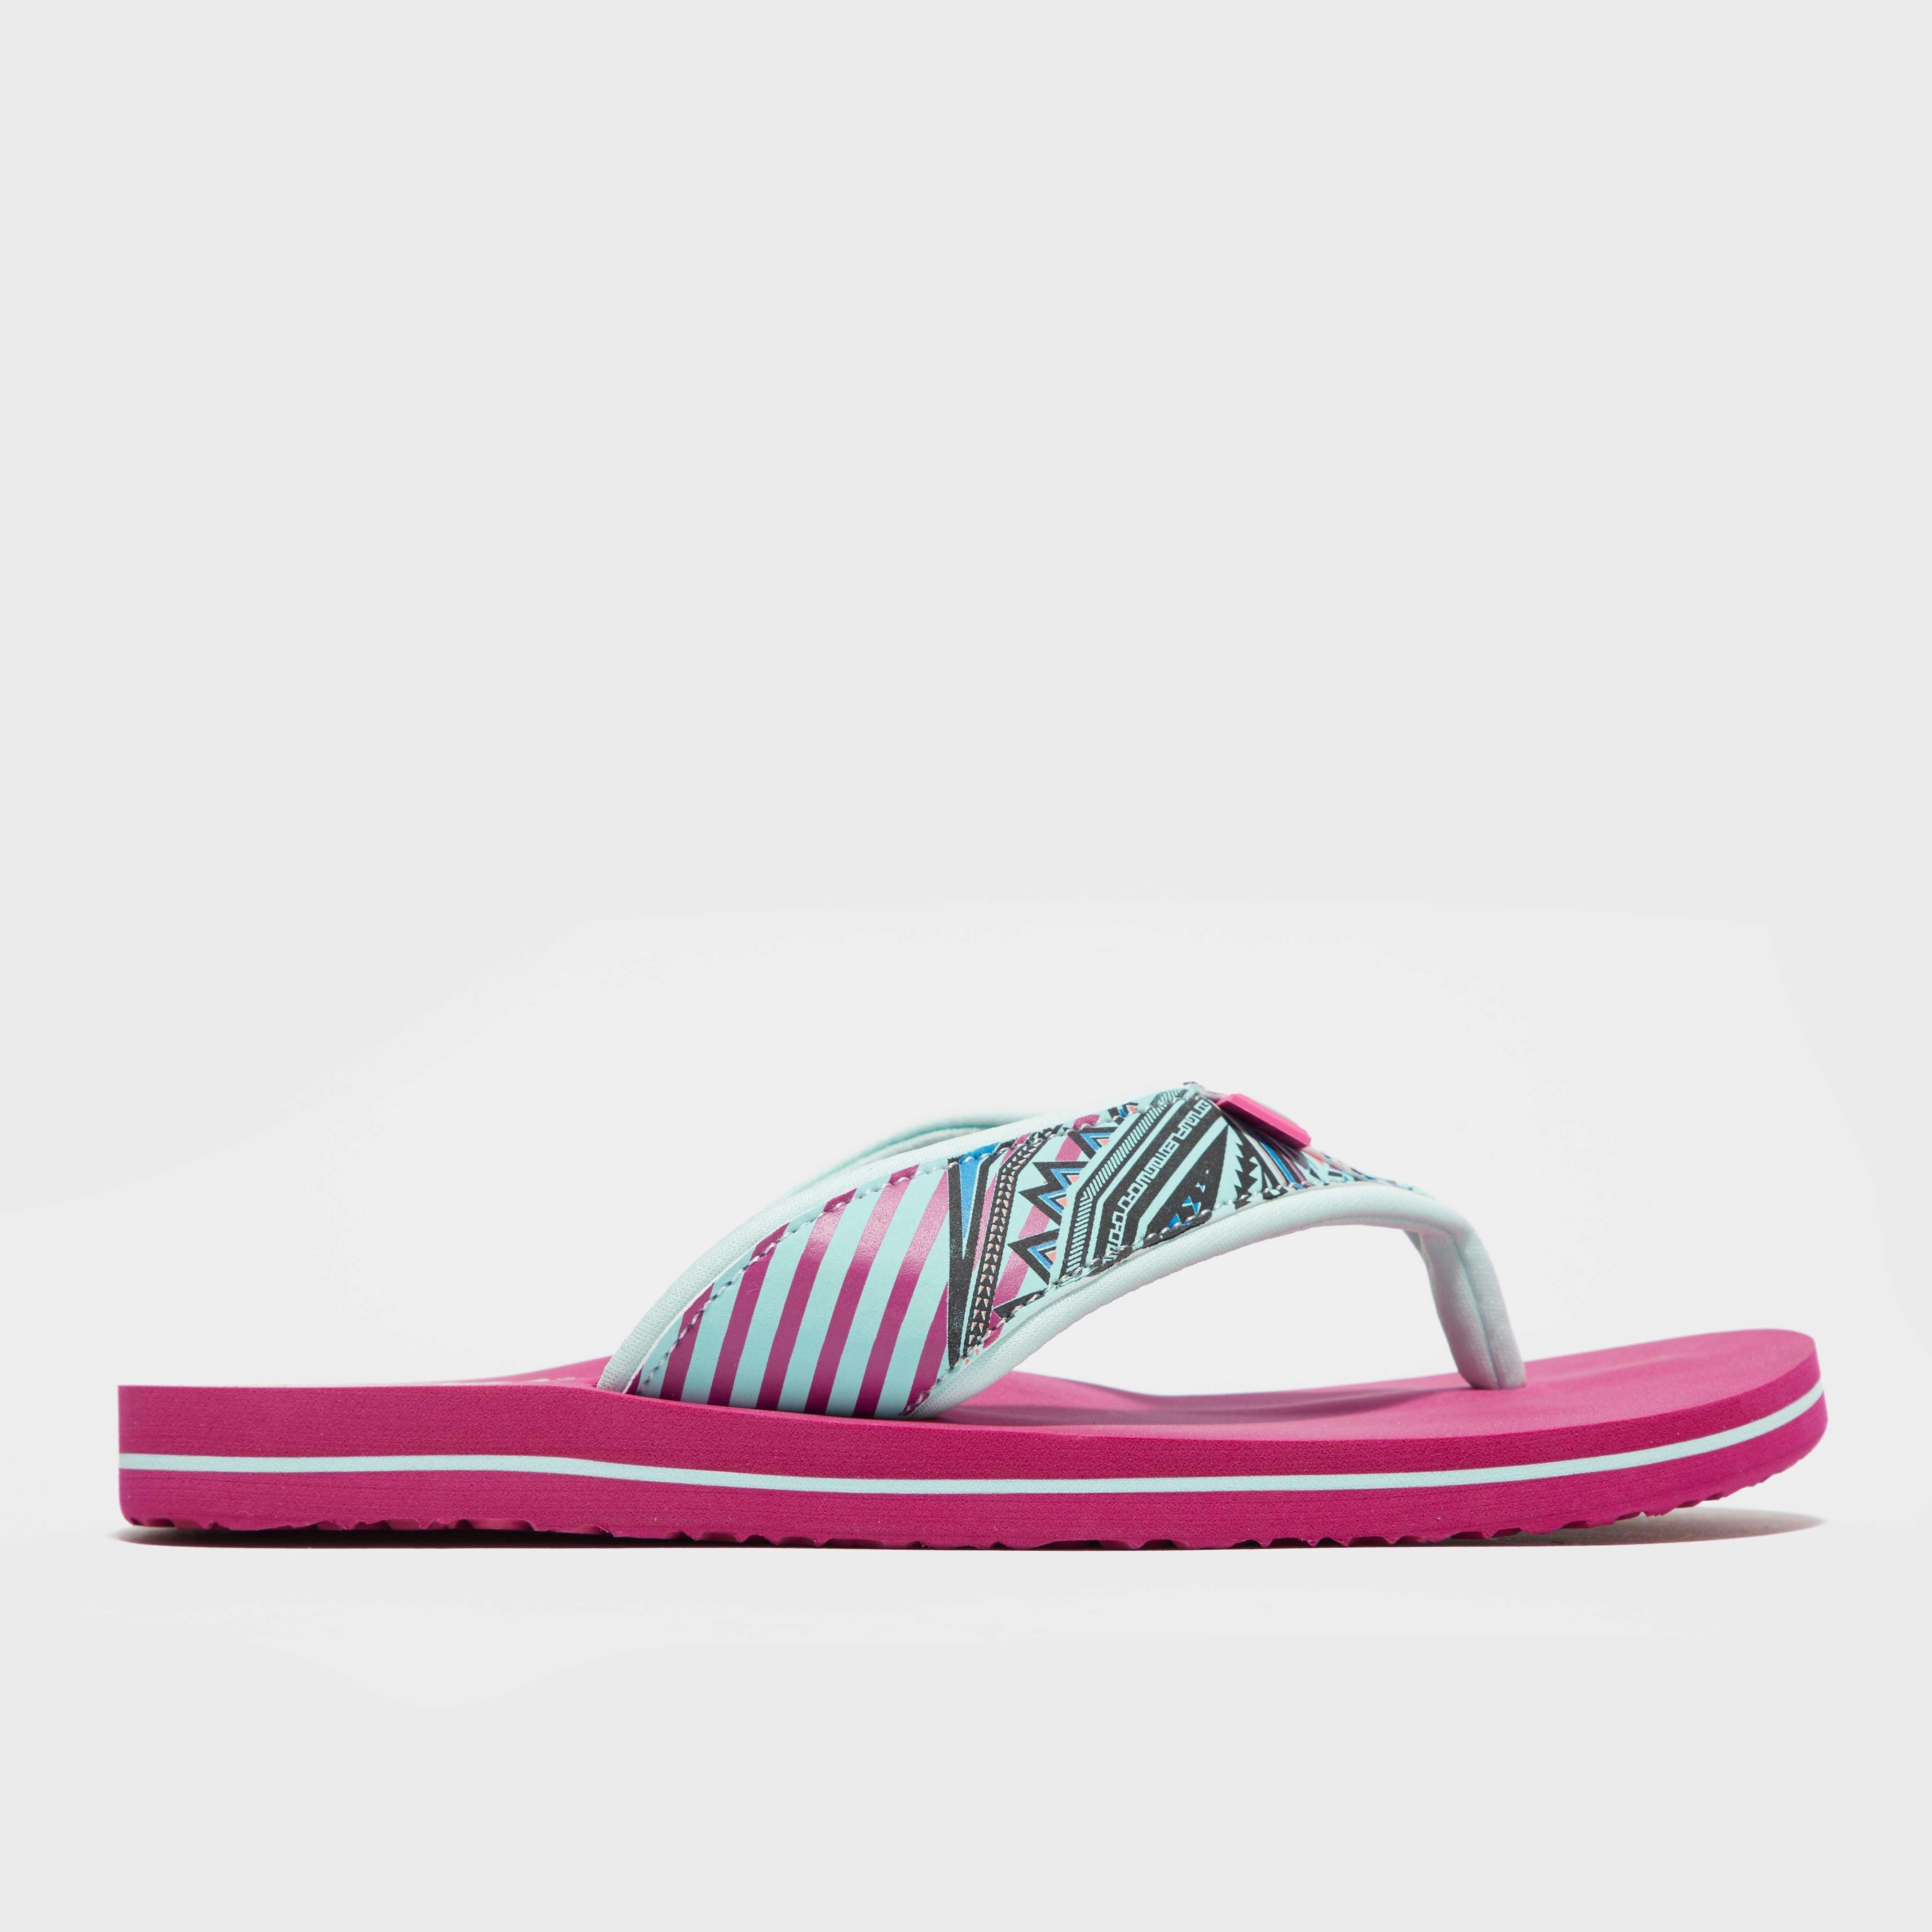 ANIMAL Women's Swish Slim Flip Flops